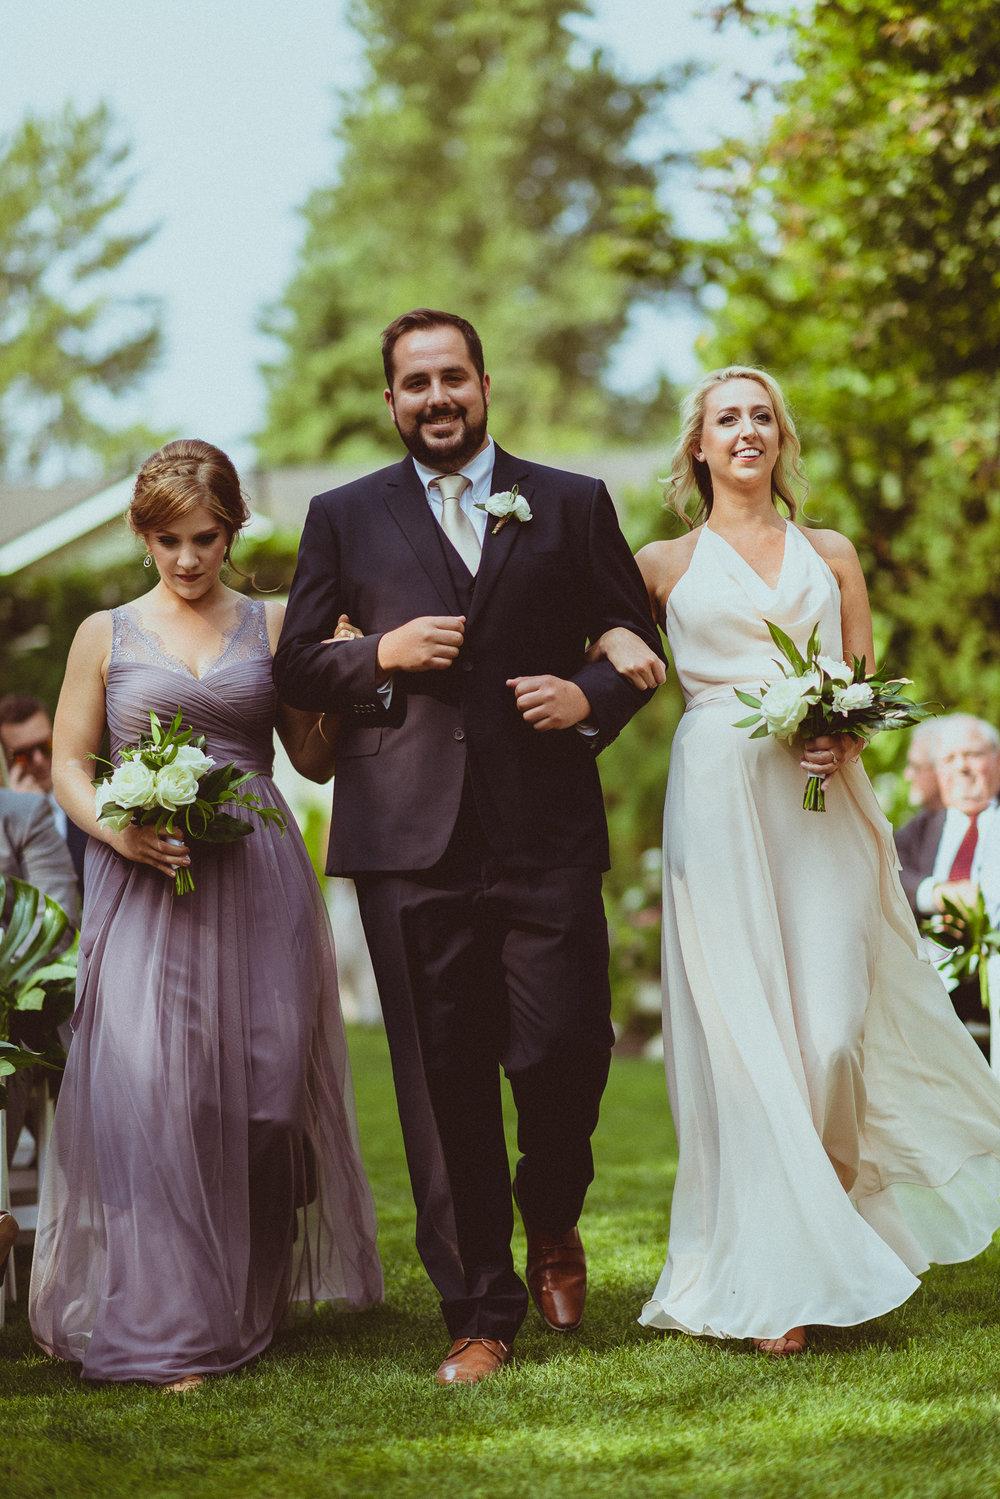 BEST_CHICAG_WEDDING_PHOTOGRAPHER_ZOE_RAIN_-50.jpg